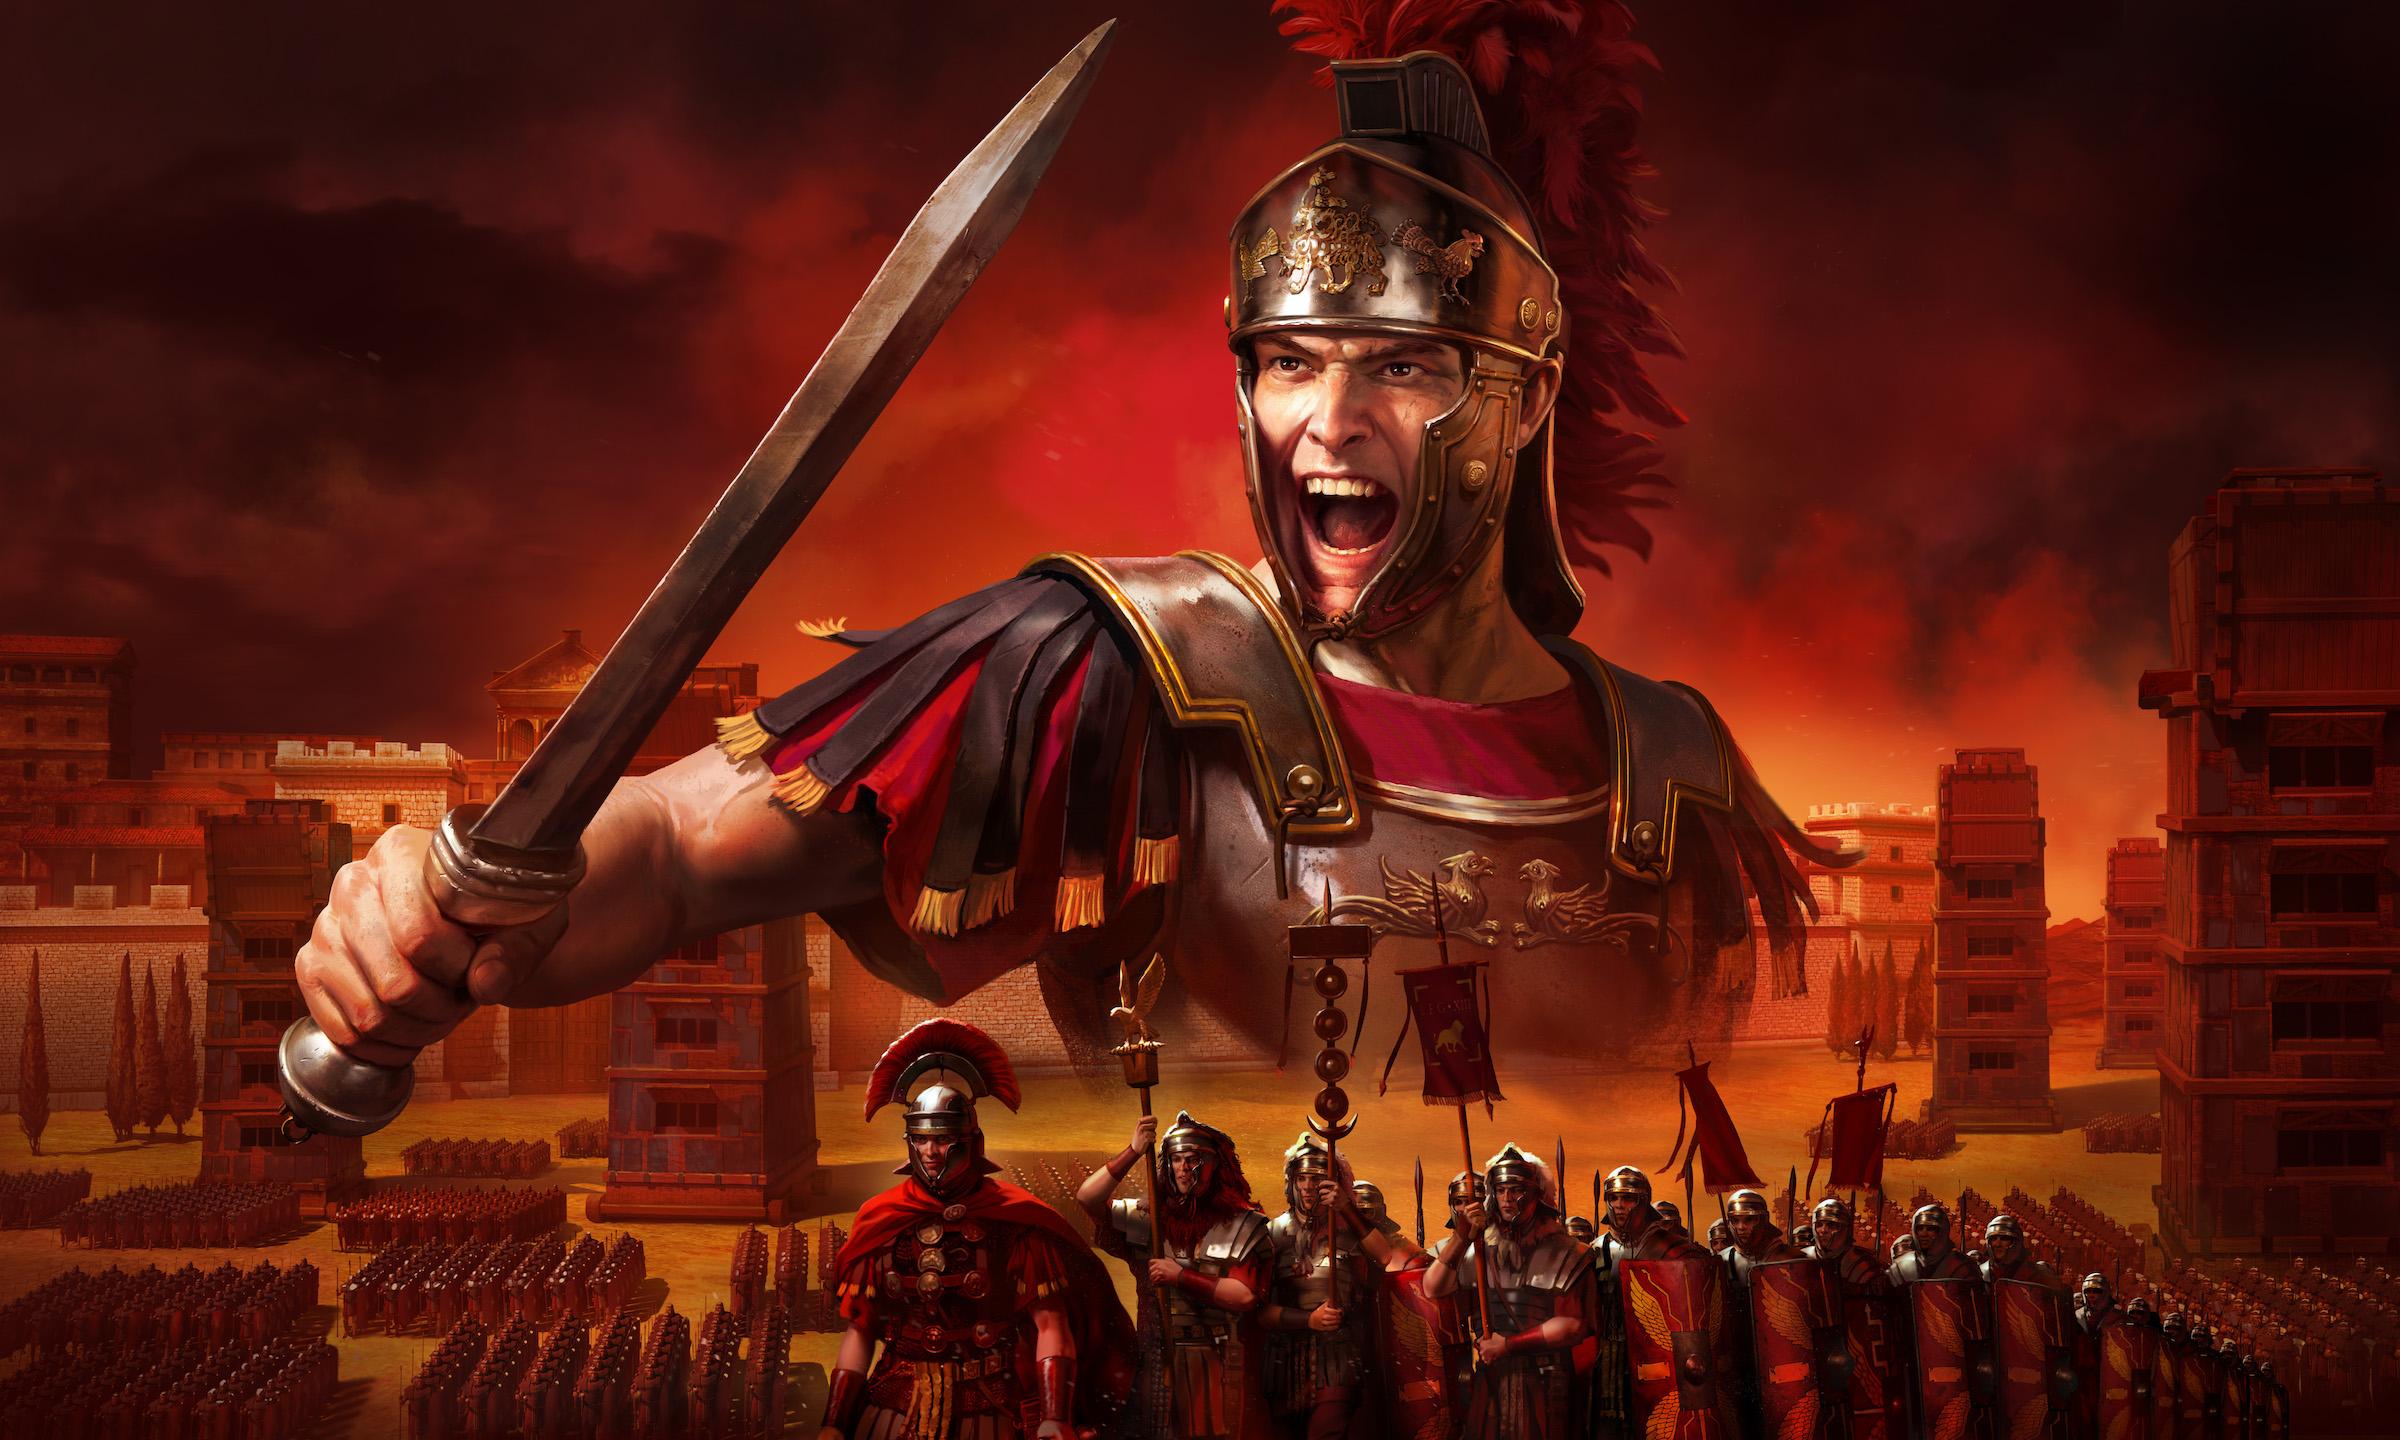 Artwork from Total War: Rome